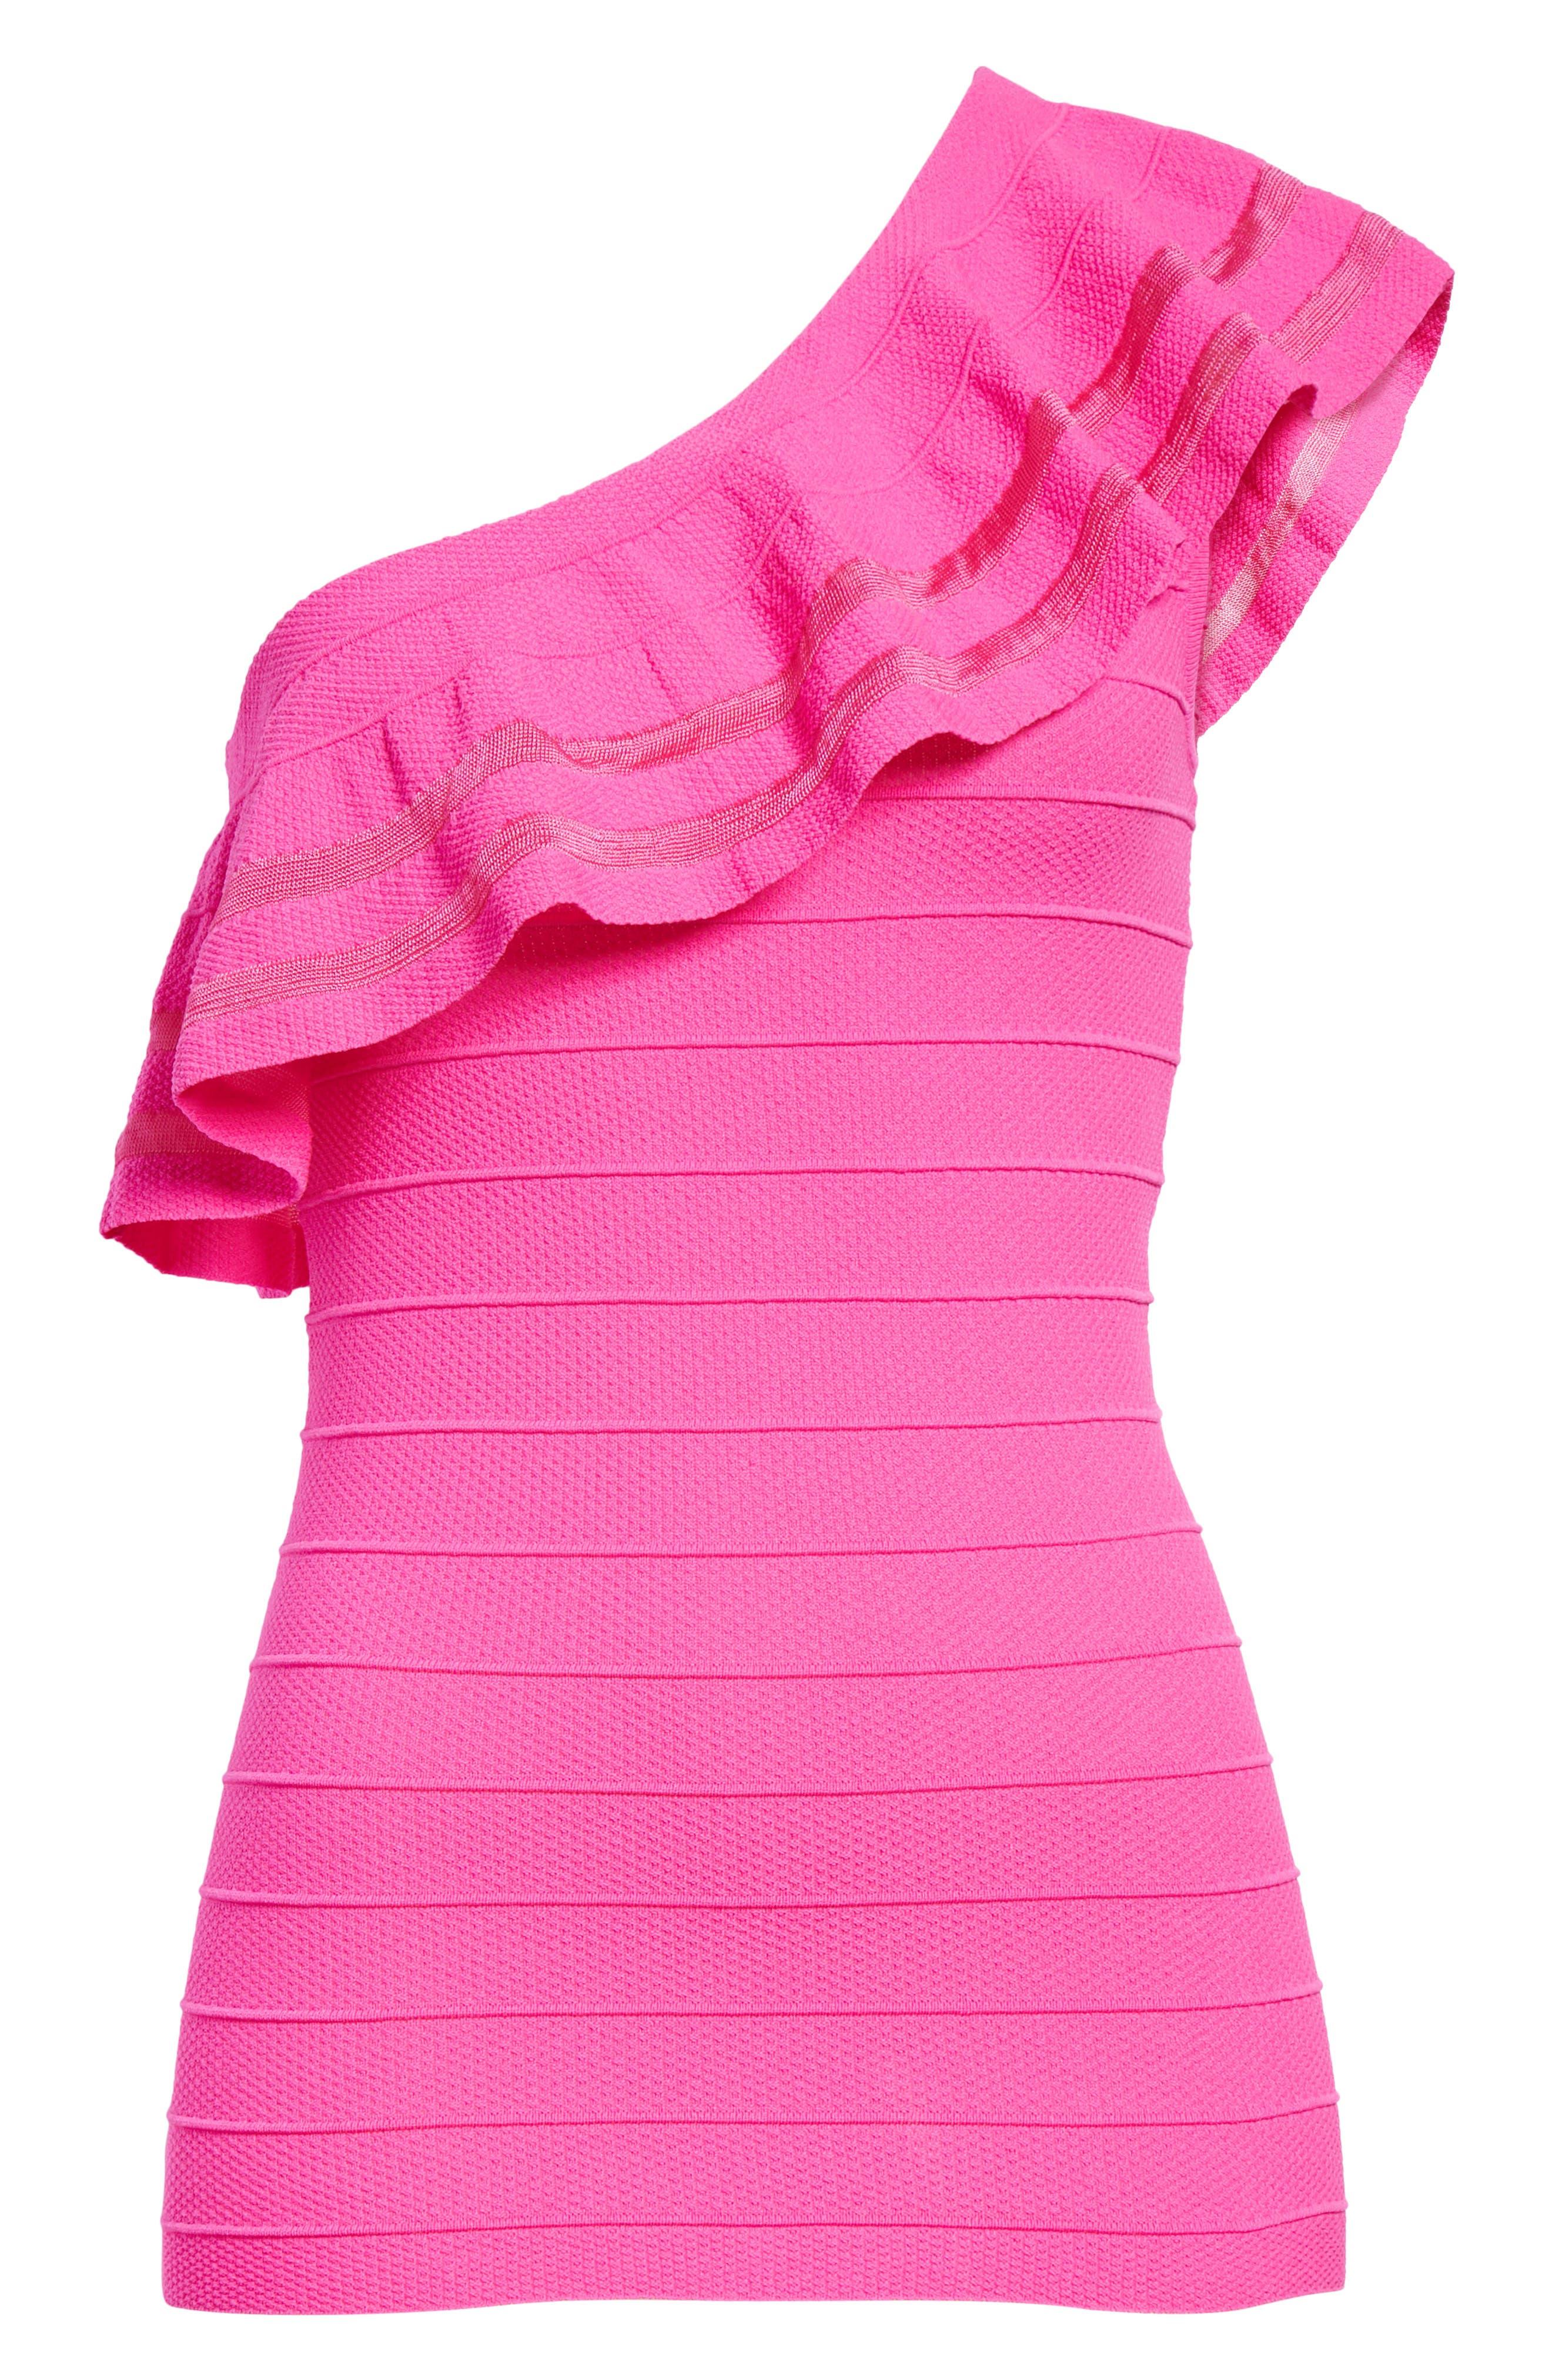 Reigann One-Shoulder Ruffle Knit Top,                             Alternate thumbnail 6, color,                             671